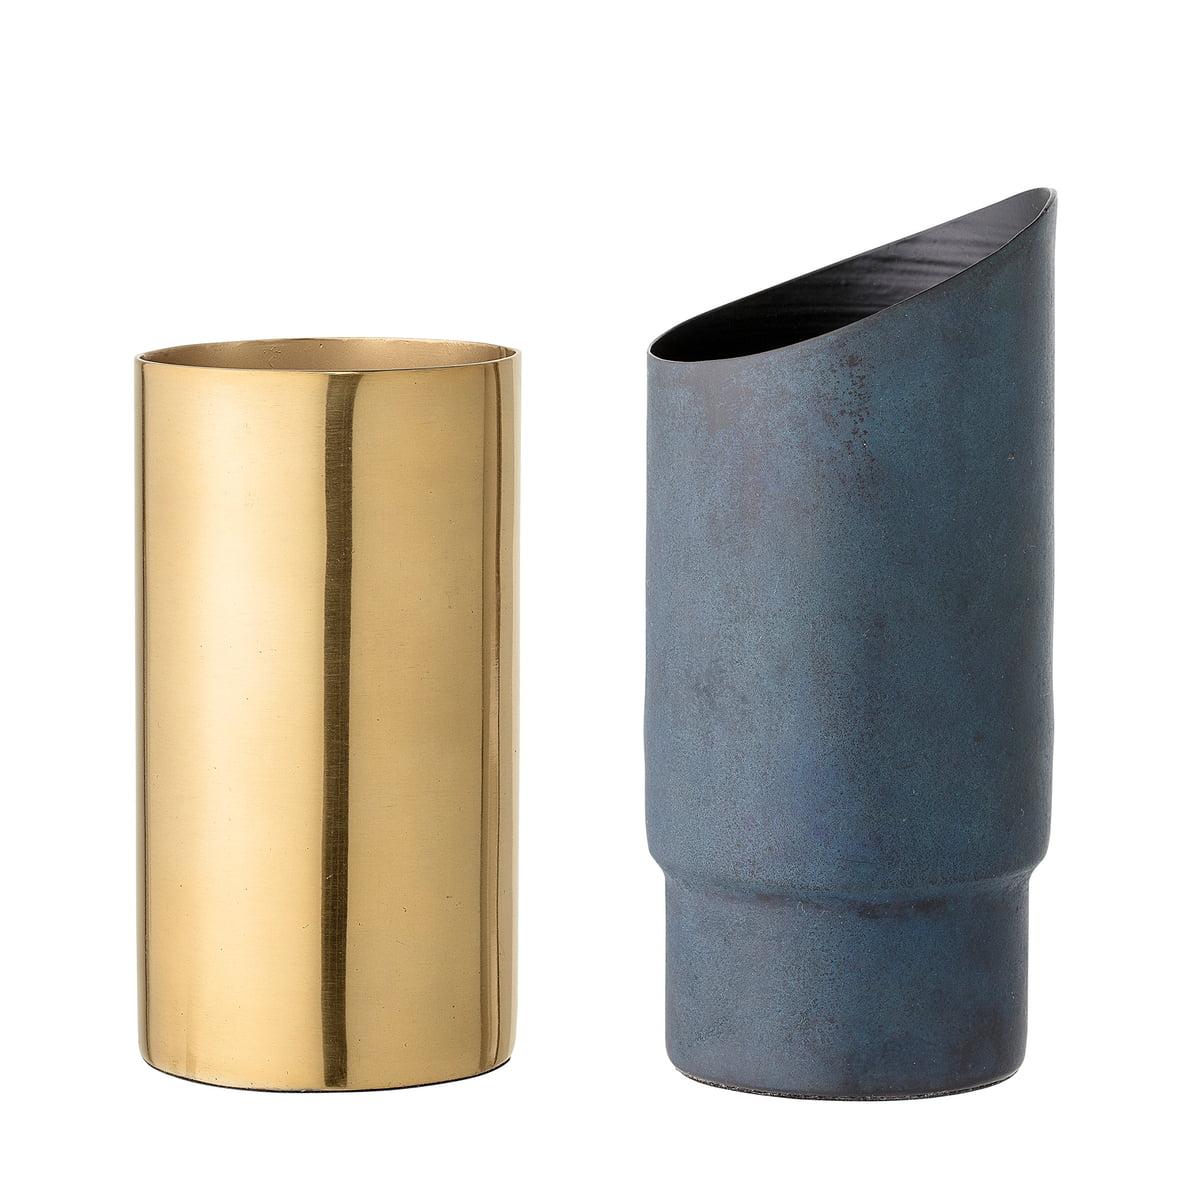 metal vase by bloomingville connox. Black Bedroom Furniture Sets. Home Design Ideas